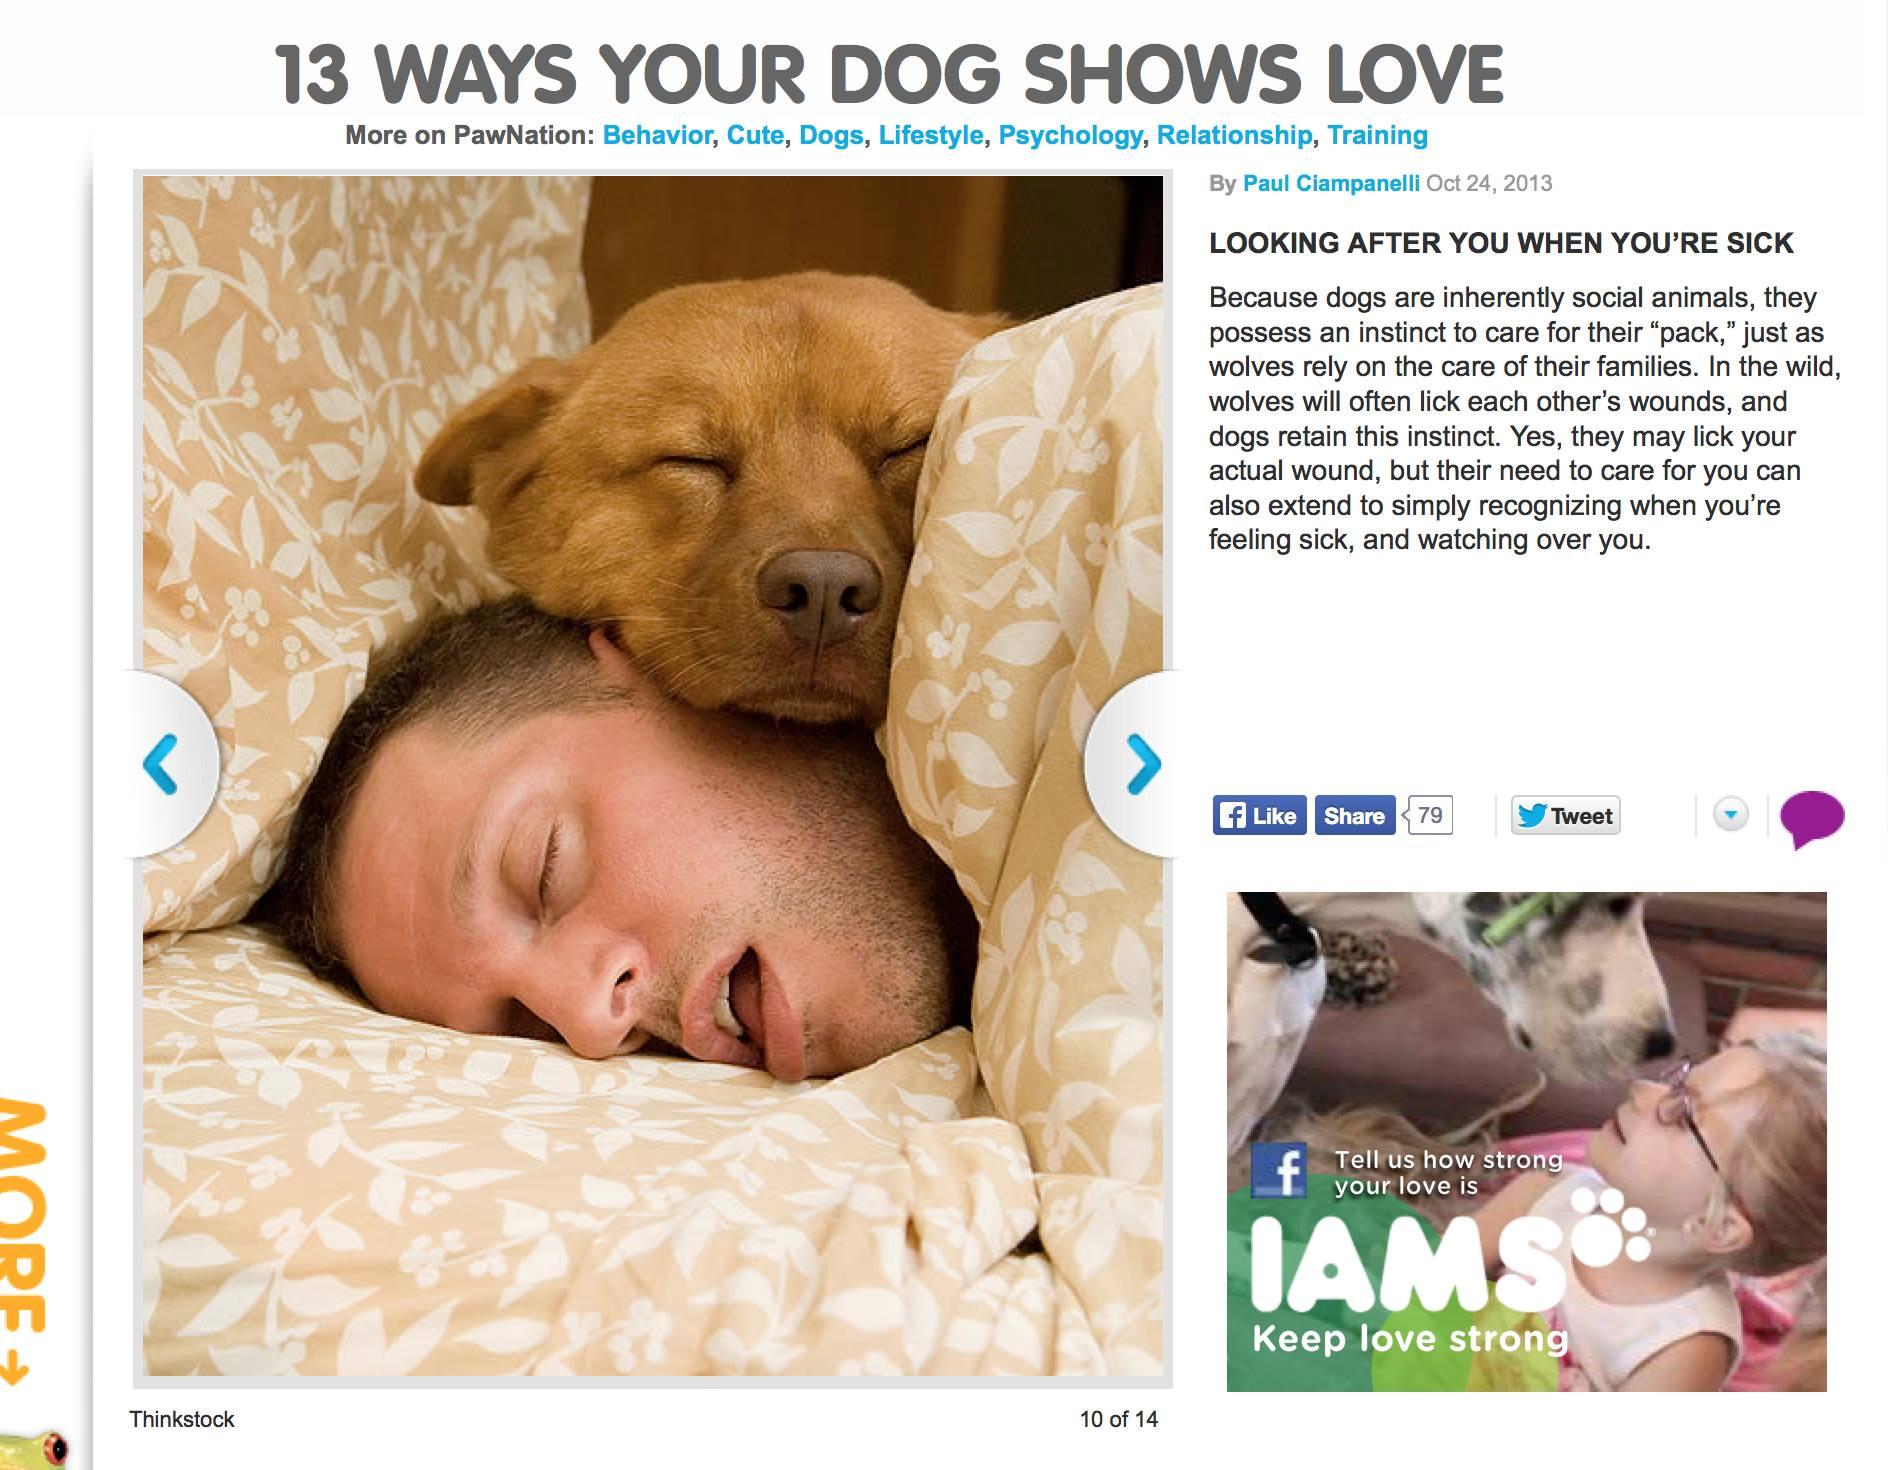 13-ways-your-dog-shows-love.jpg